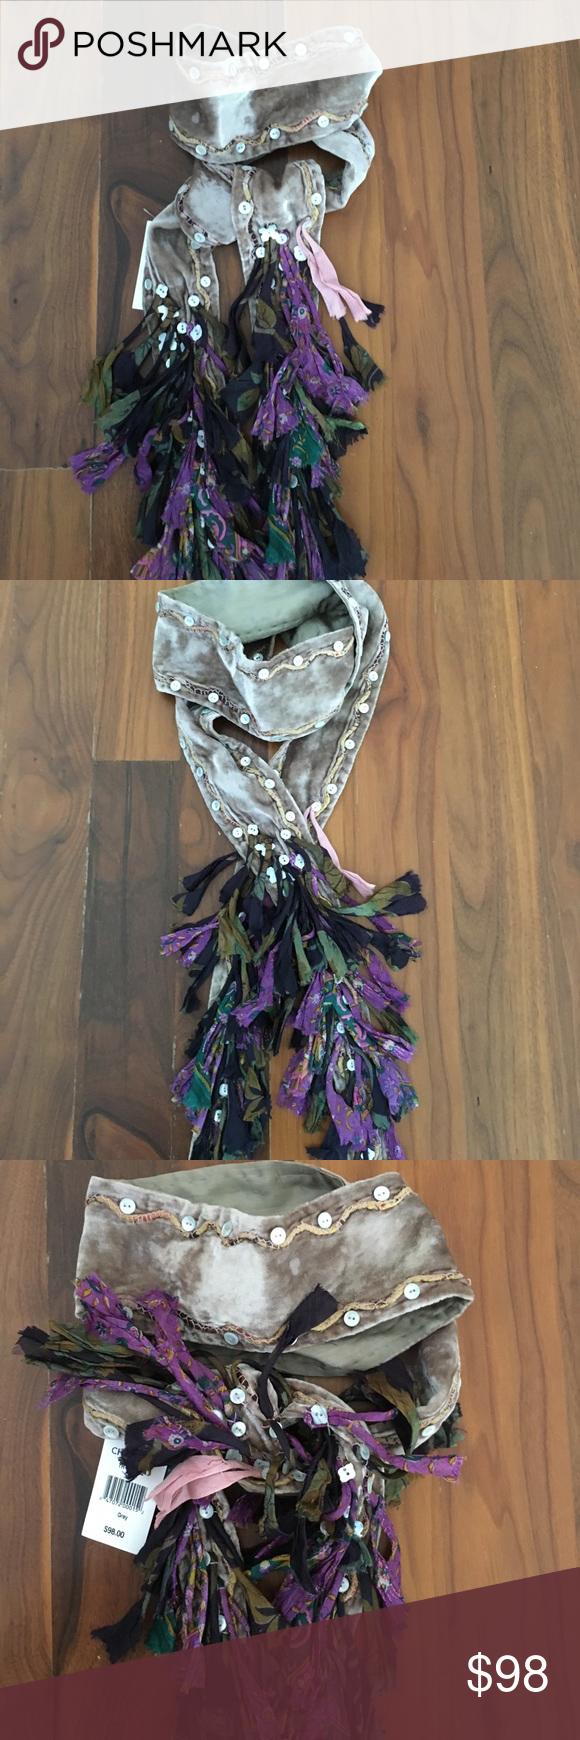 9c4847ddd516 Chan Luu Scarf Chan Luu silvery taupe grey crushed panne velvet silk scarf  with purple/